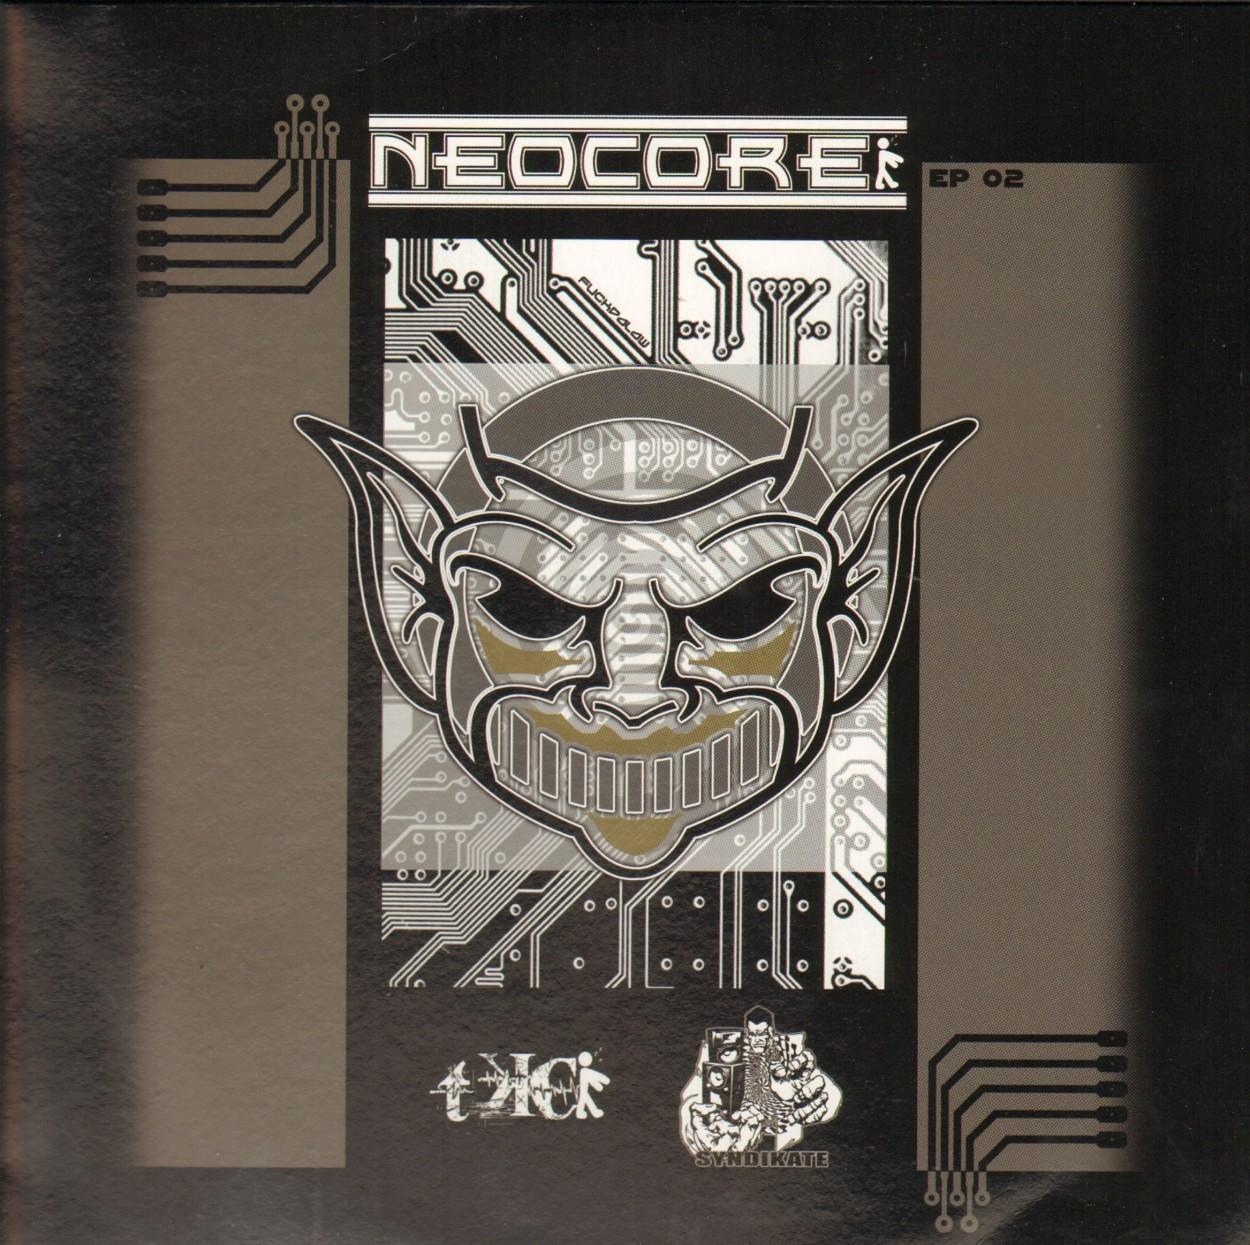 Neocore 02